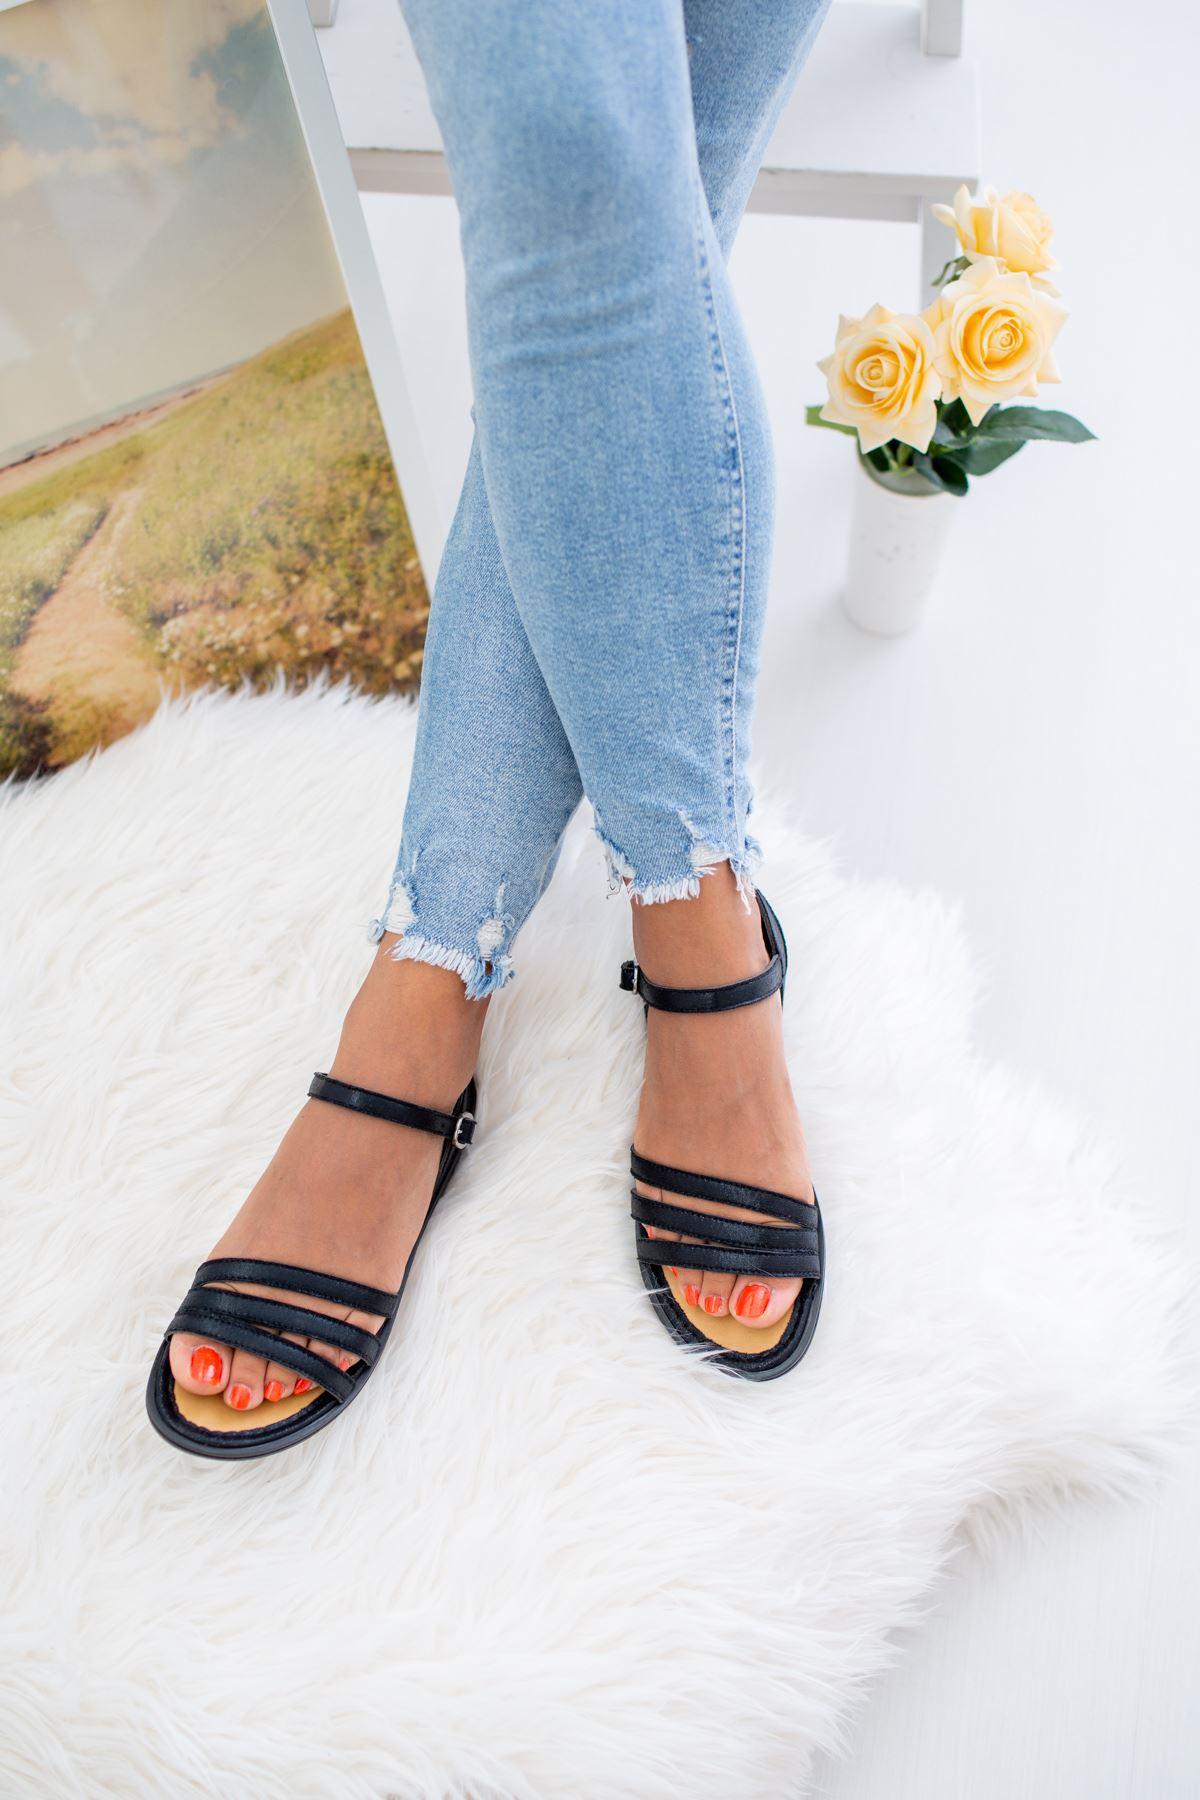 3 Bantlı Siyah Sandalet